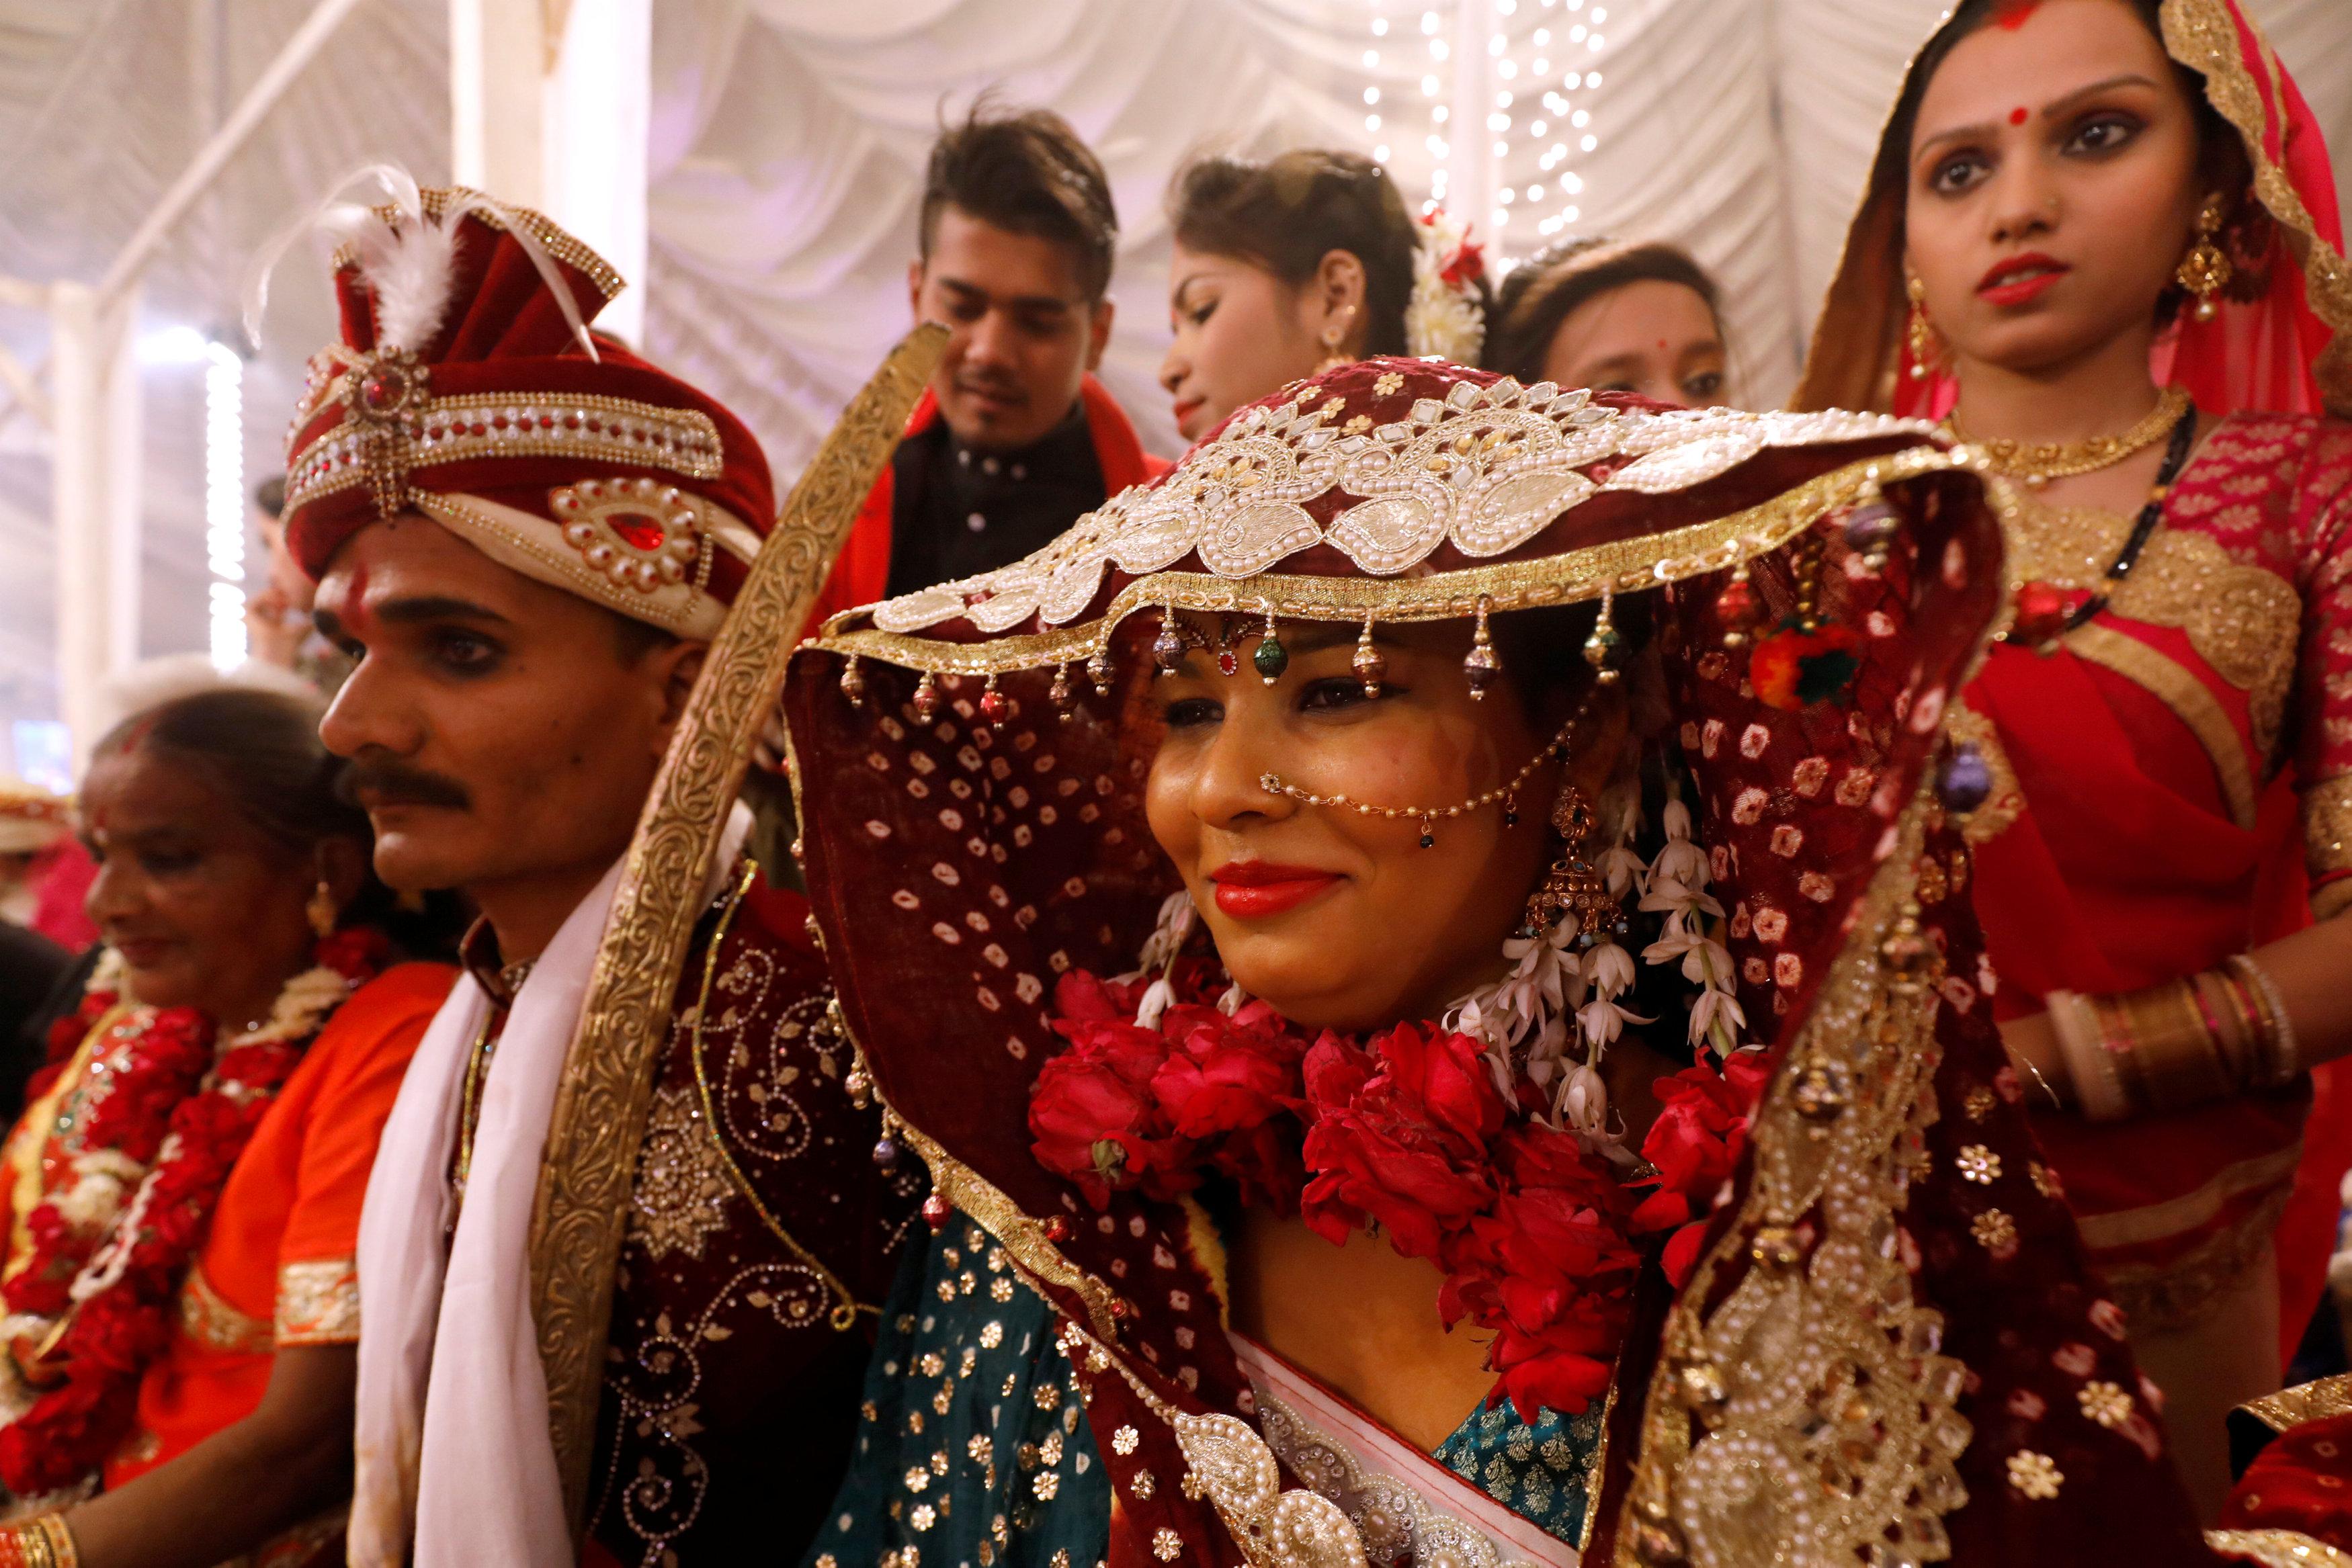 حفل زفاف جماعى للهندوس فى كراتشى (6)